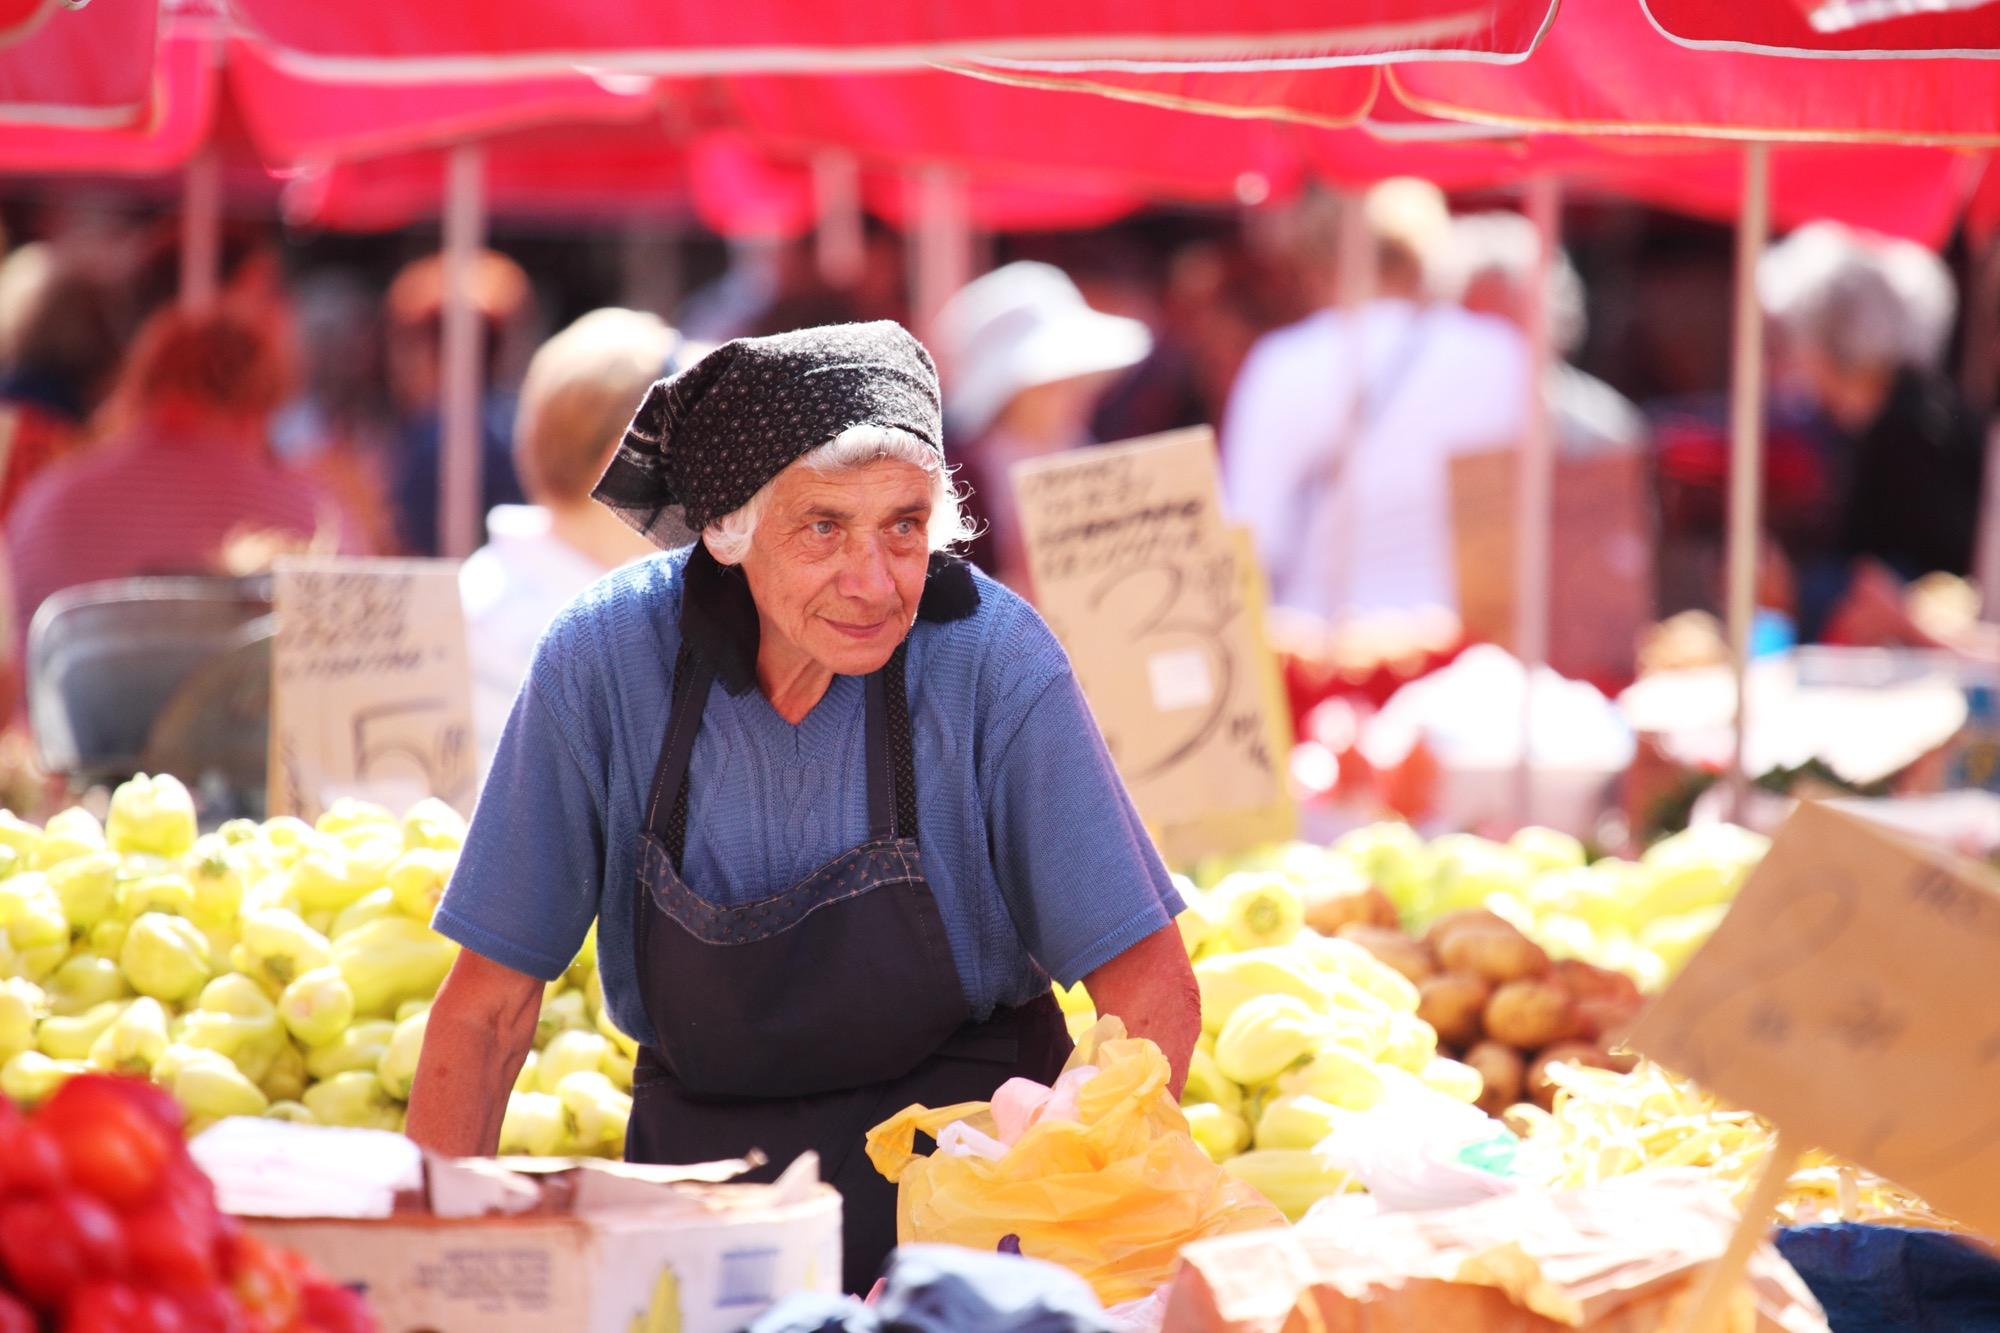 Zagreb's Dolac Market